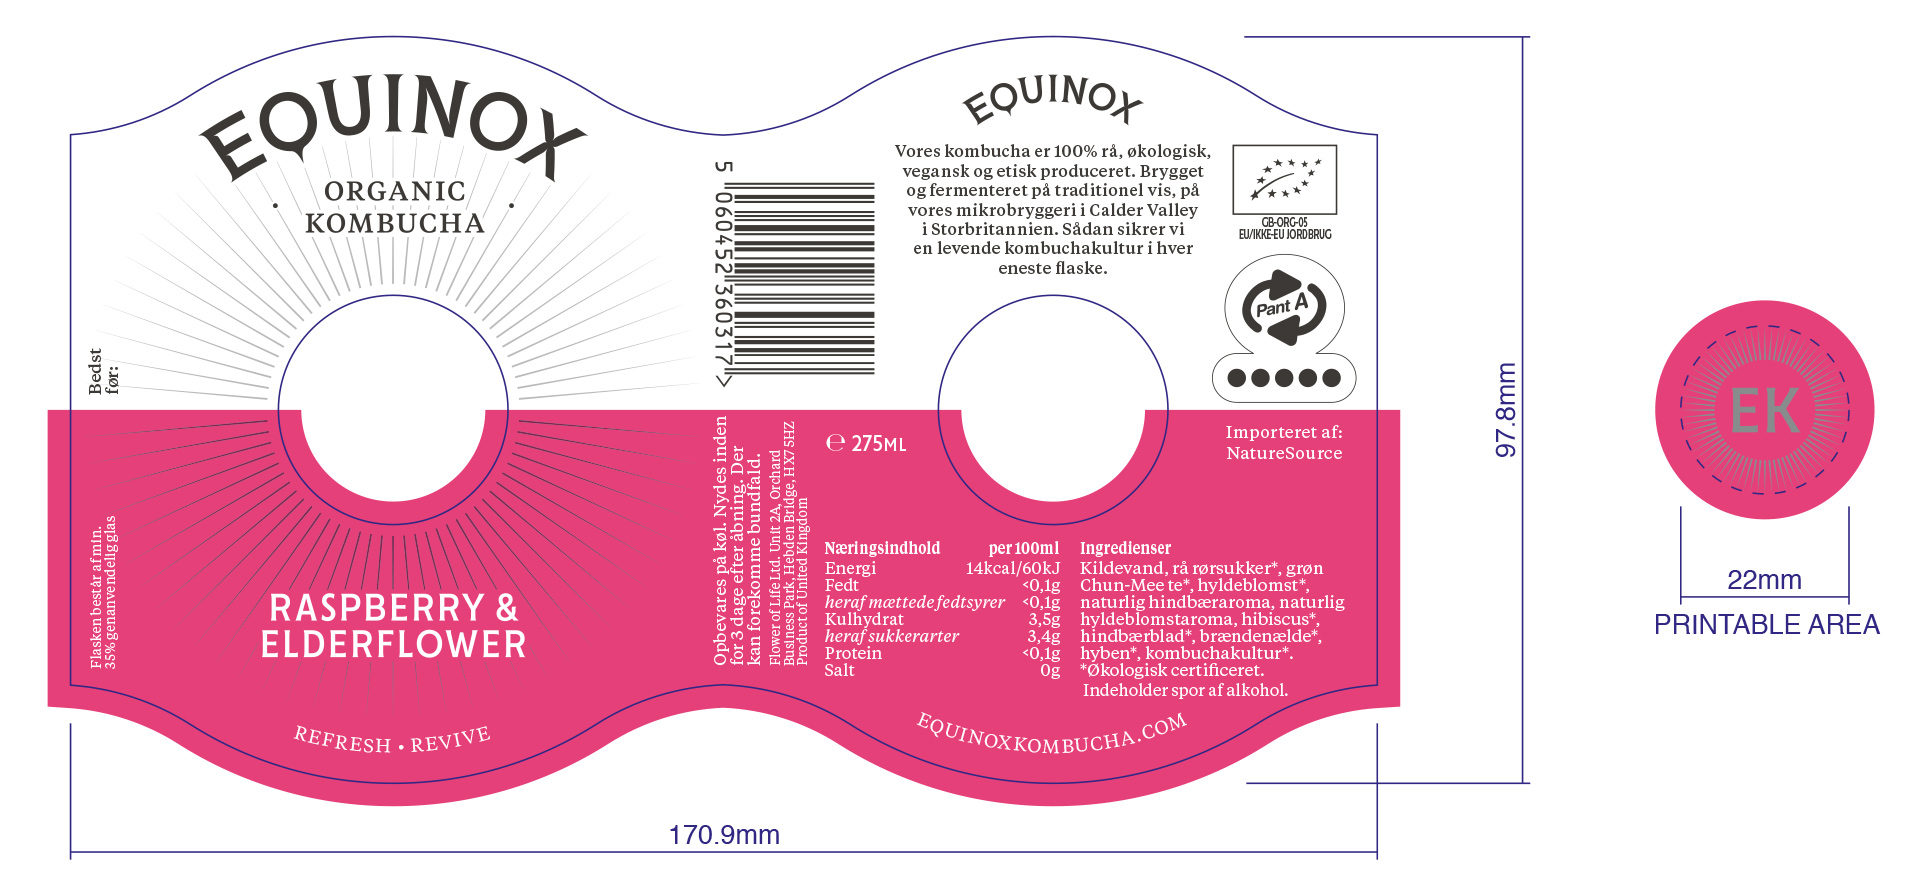 equinox-artwork-food-packaging-repro